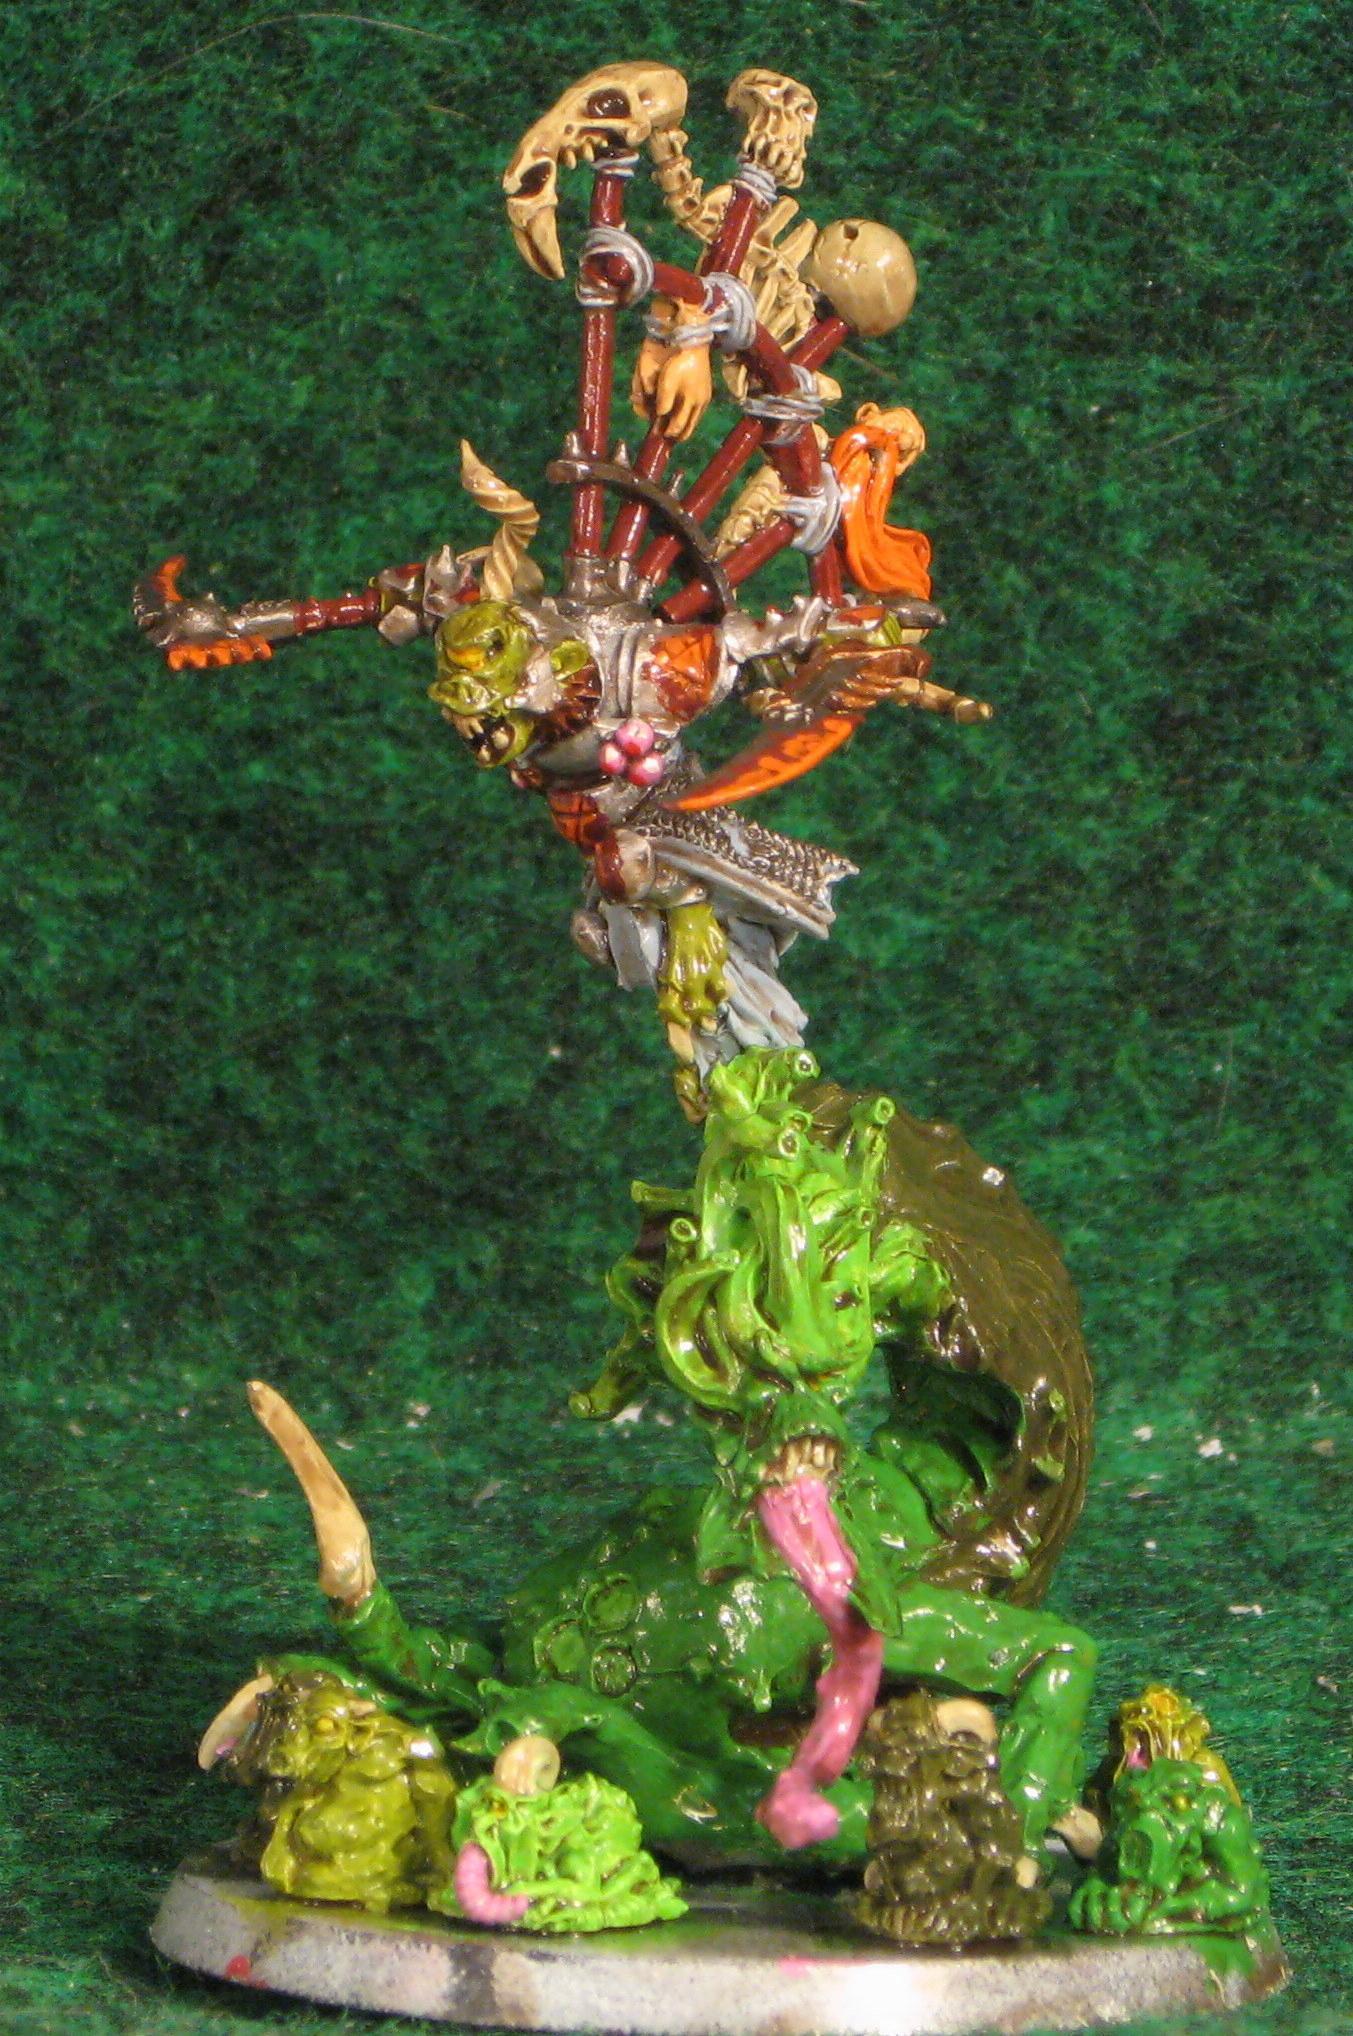 Beast Of Nurgle, Daemons, Herald Of Nurgle, Nurgle, Plaguebearers